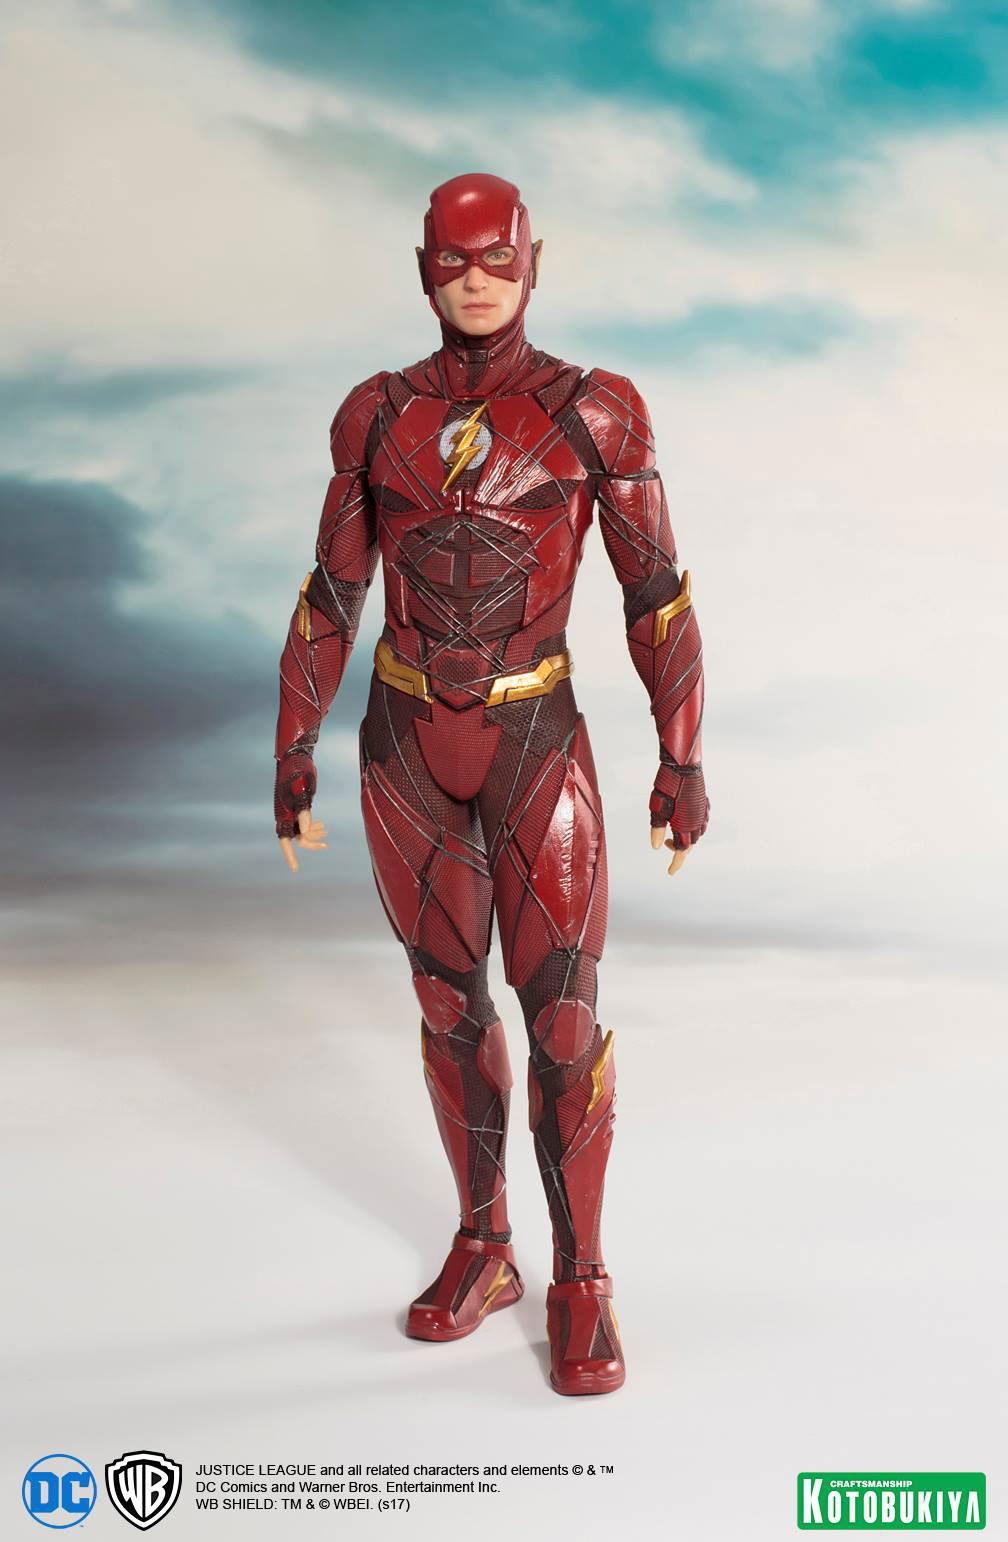 kotobukiya-justice-league-the-flash-statue